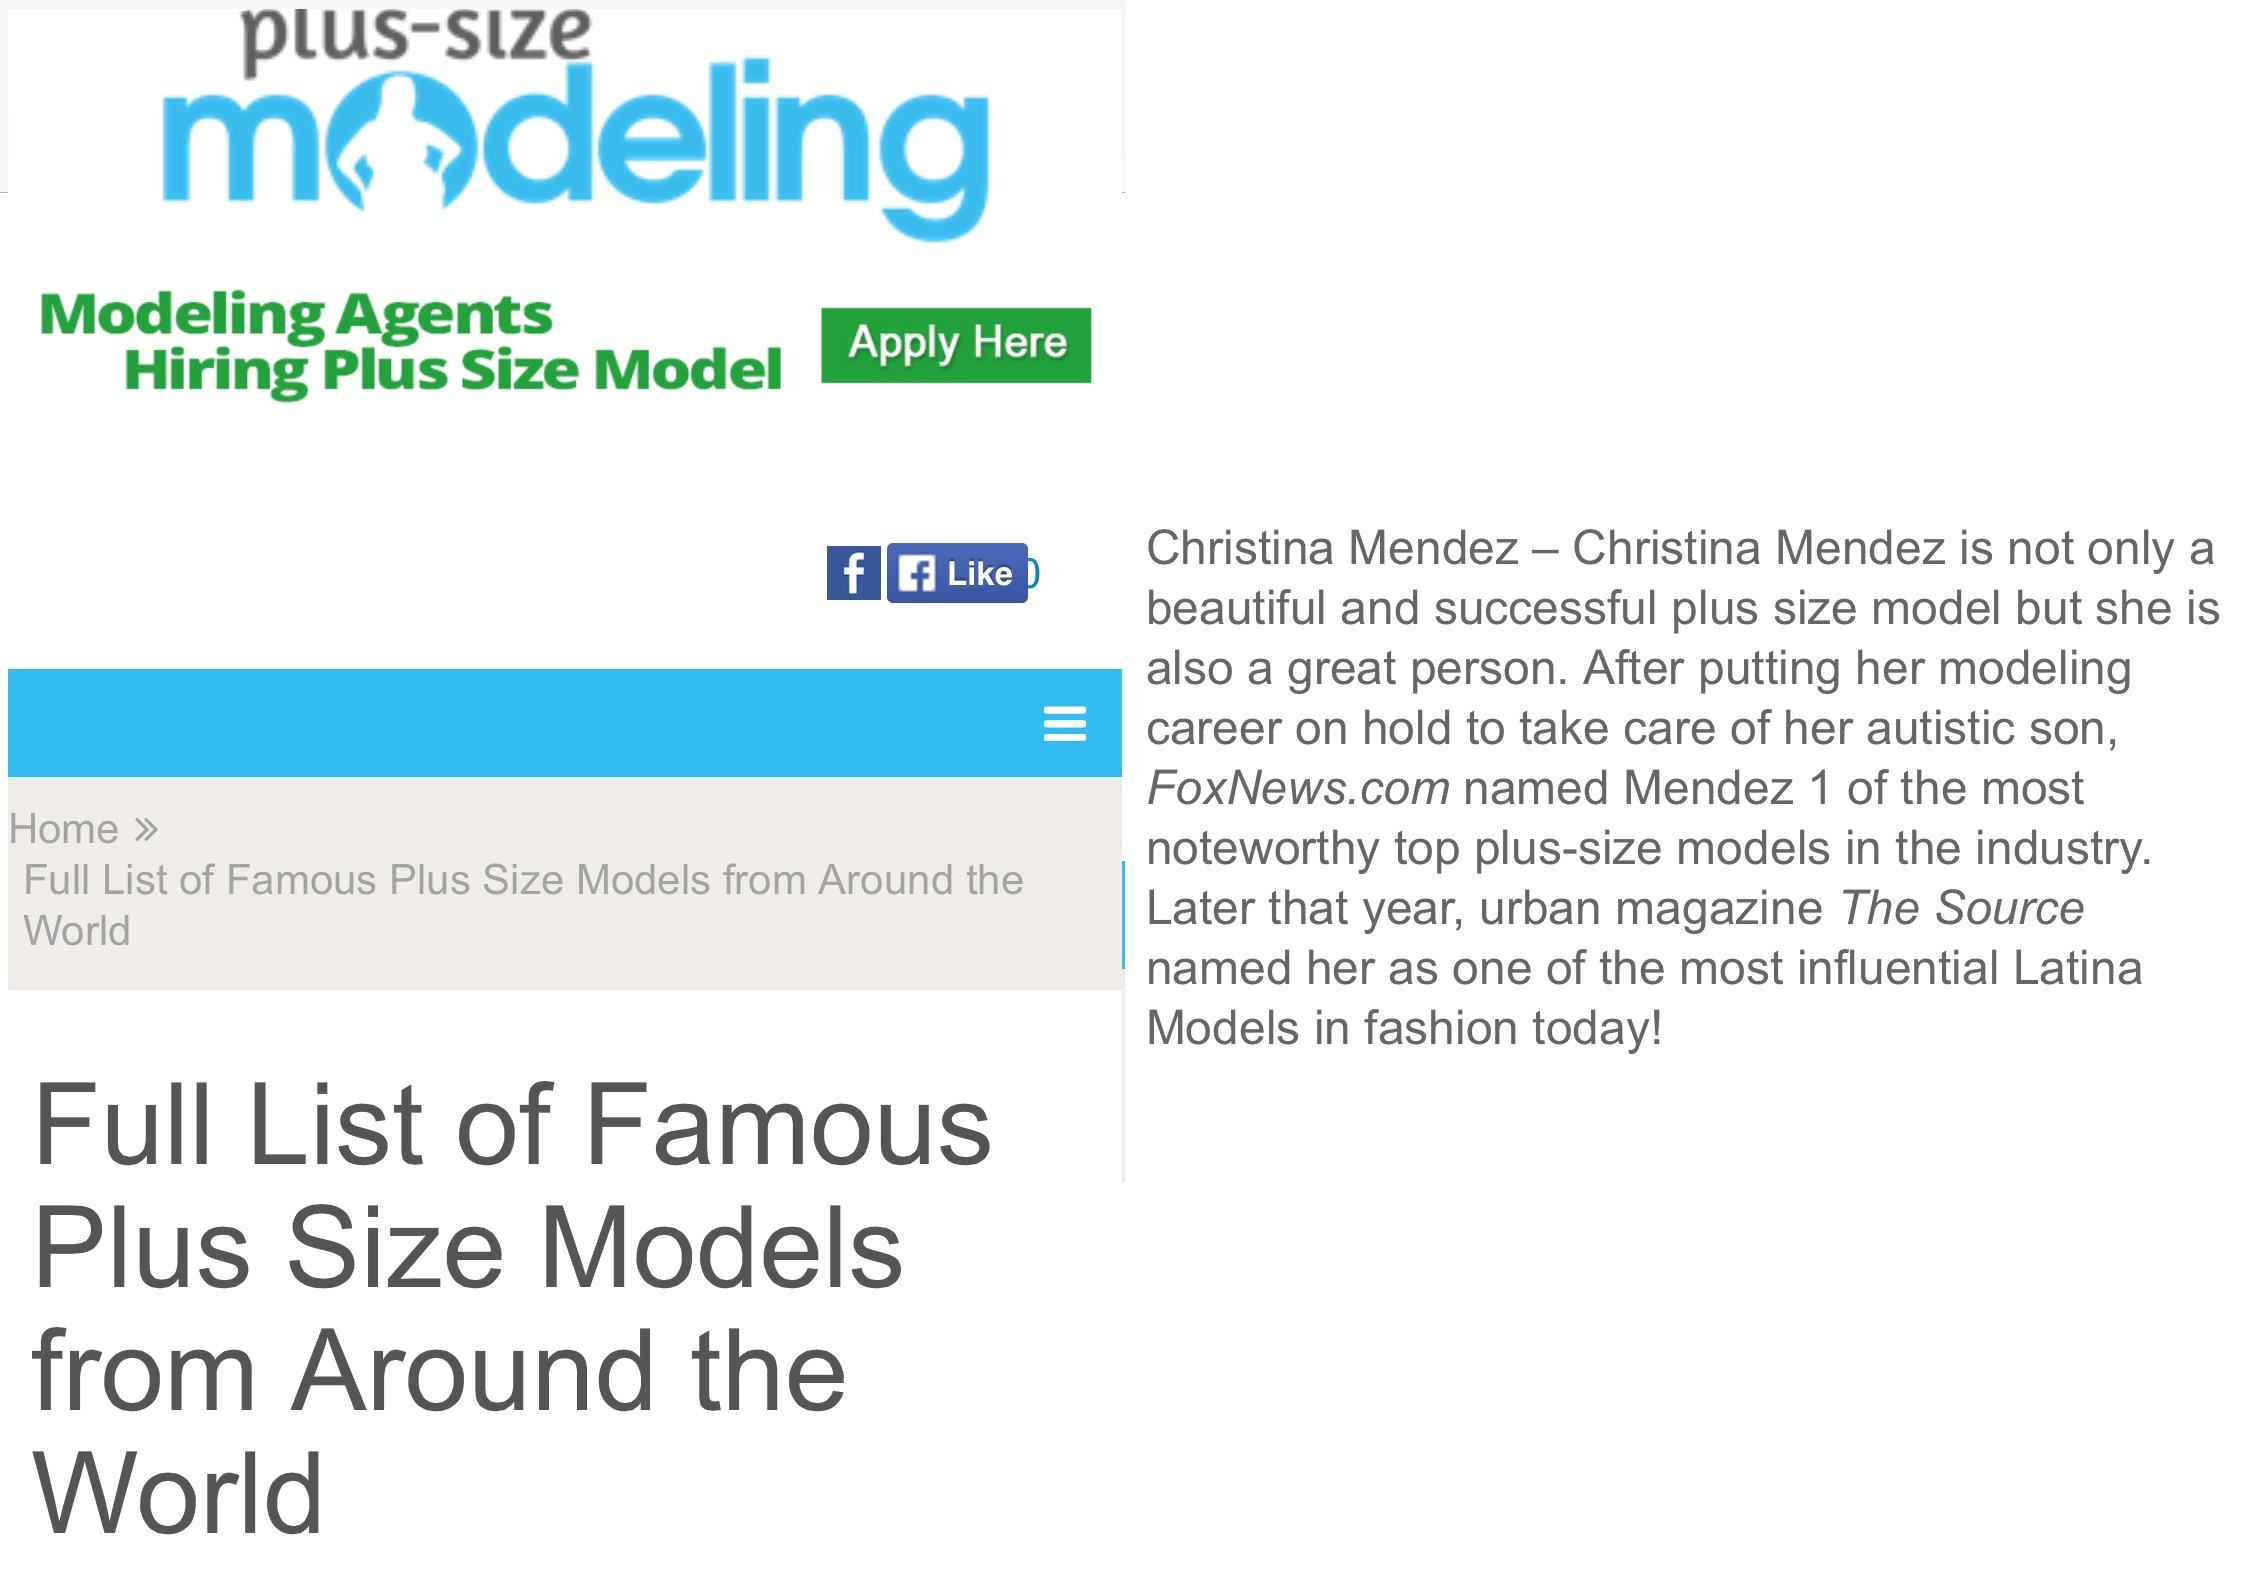 Plus-Size Modeling